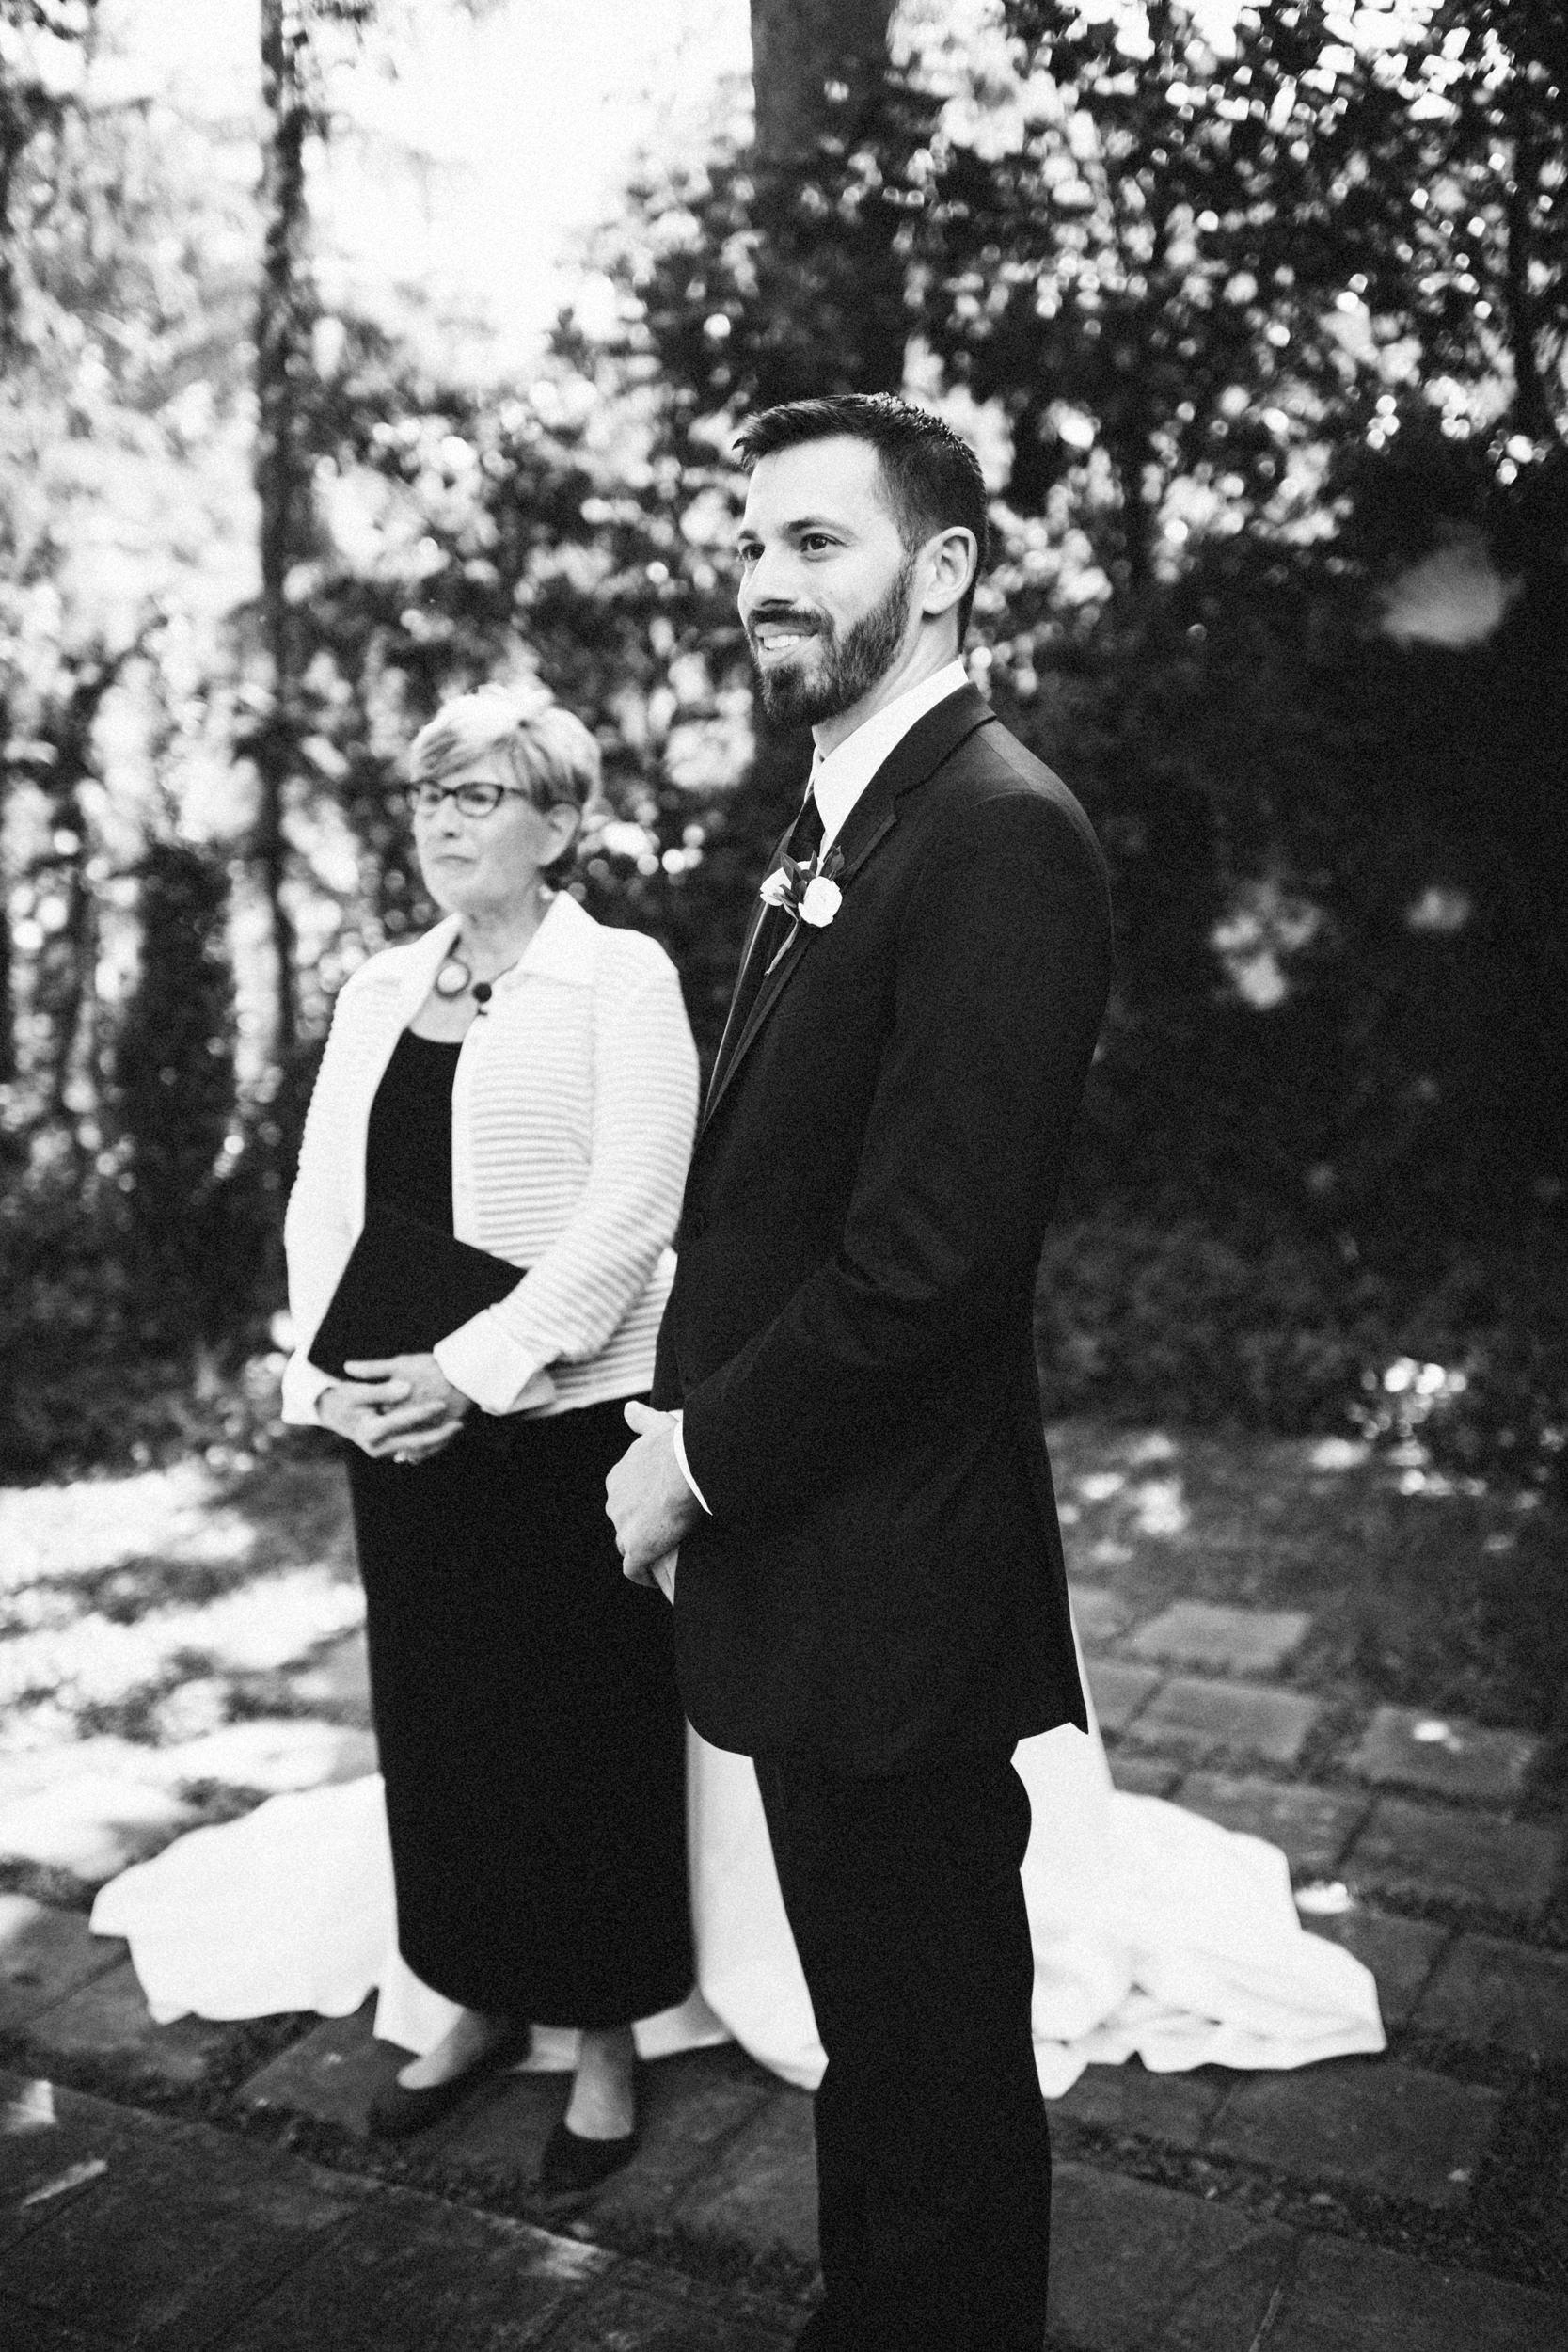 Louisville-Kentucky-Wedding-Elopement-Photographer-Sarah-Katherine-Davis-Photography-Whitehall-Classic-Timeless-Garden-Wedding-315.jpg